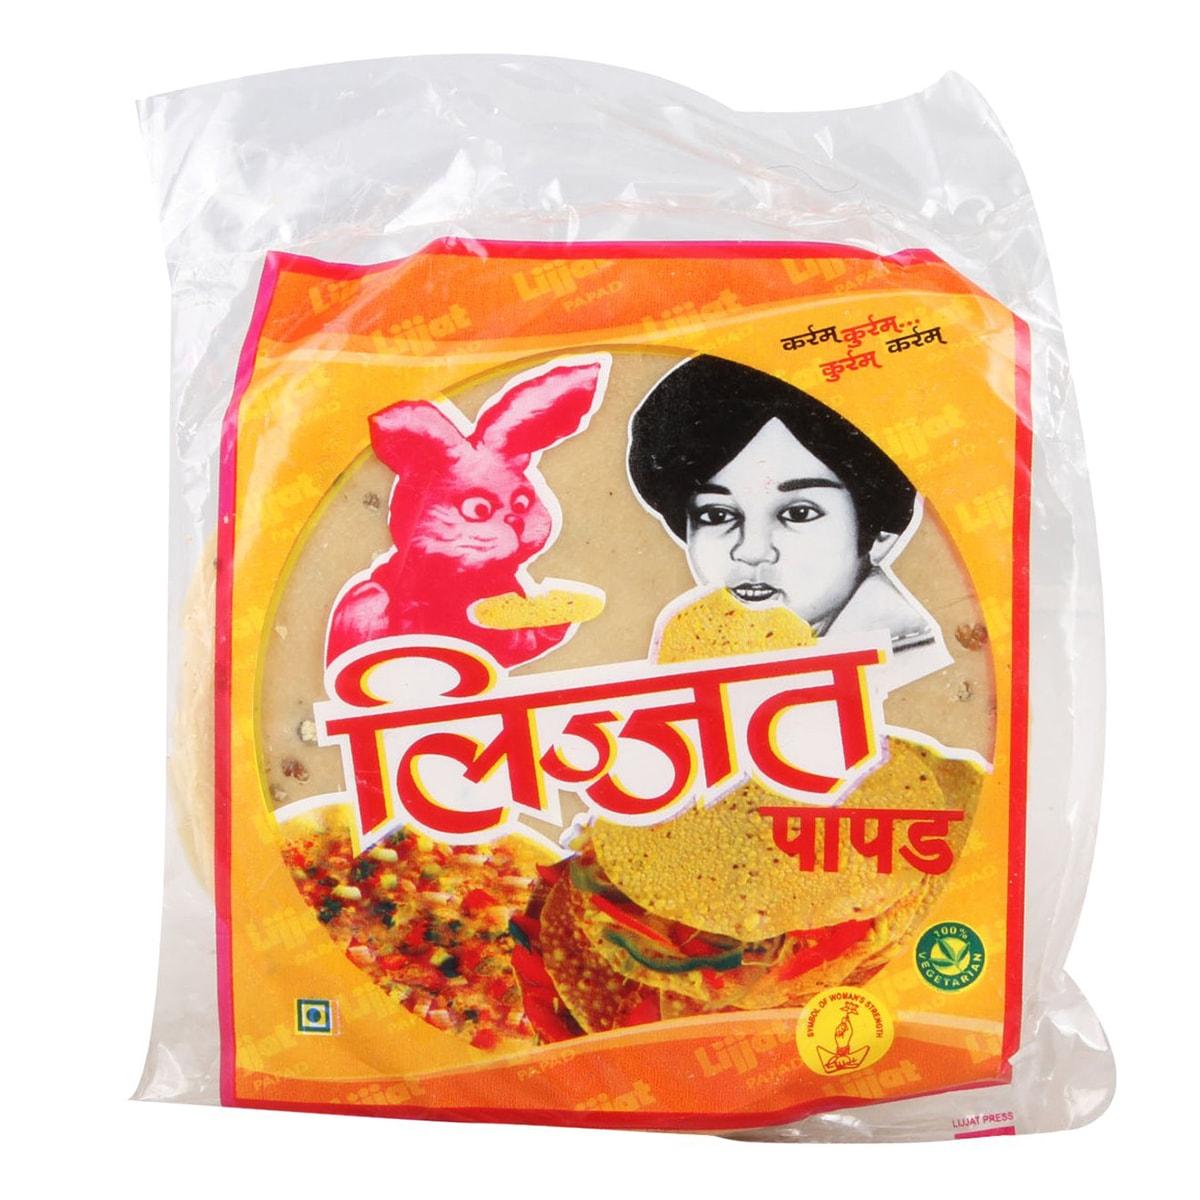 Buy Lijjat Papad Udad with Plain Udad (Plain Papad) - 200 gm